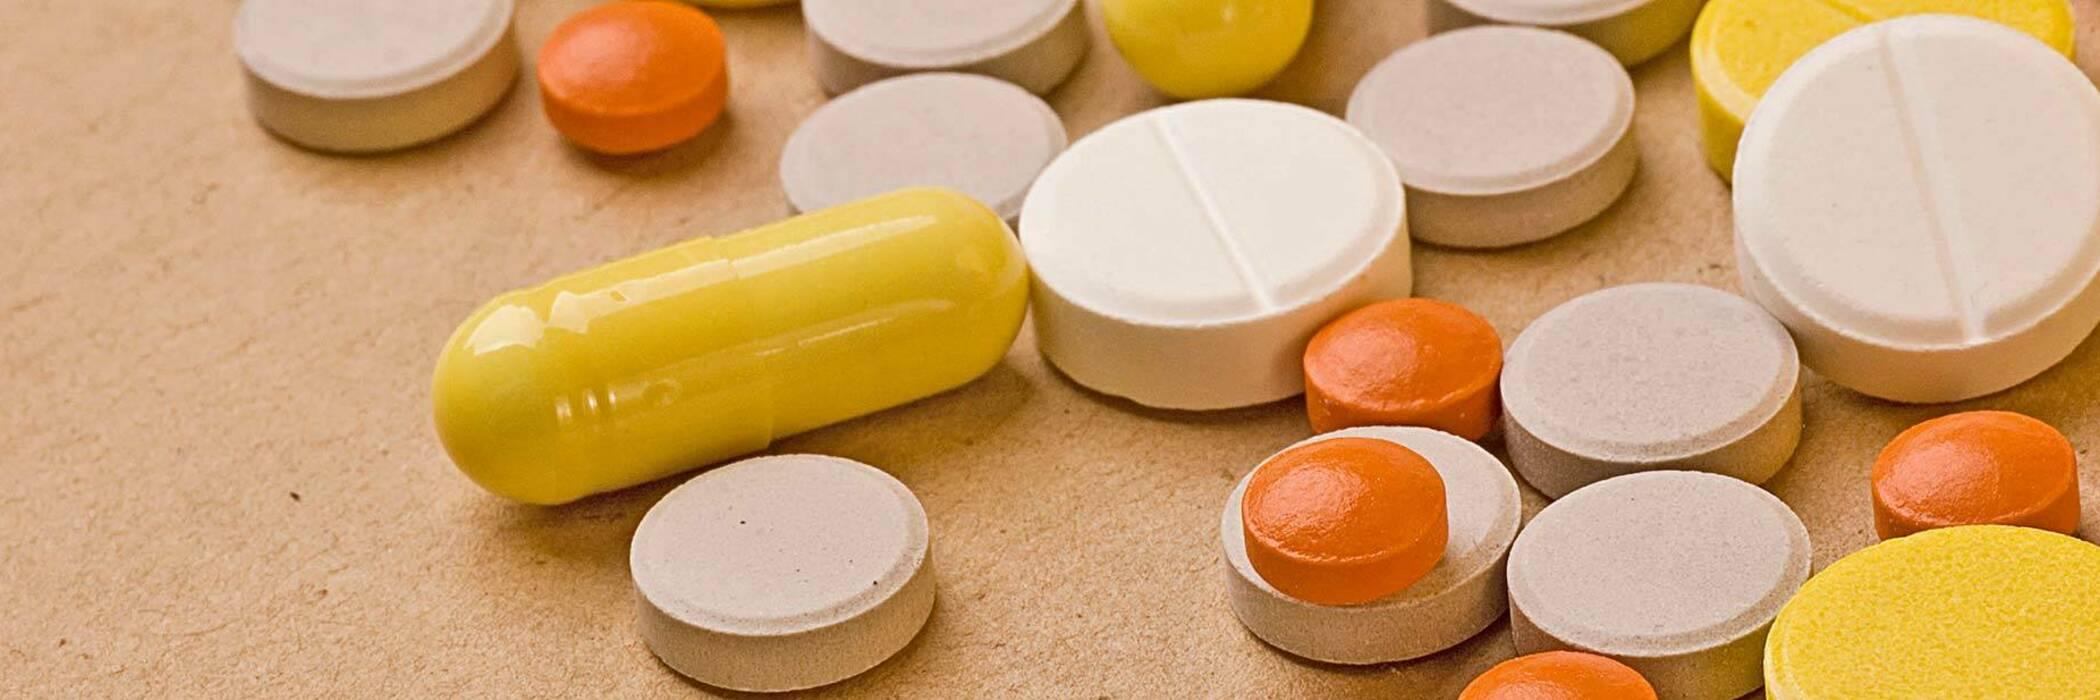 13mar antioxidants hero